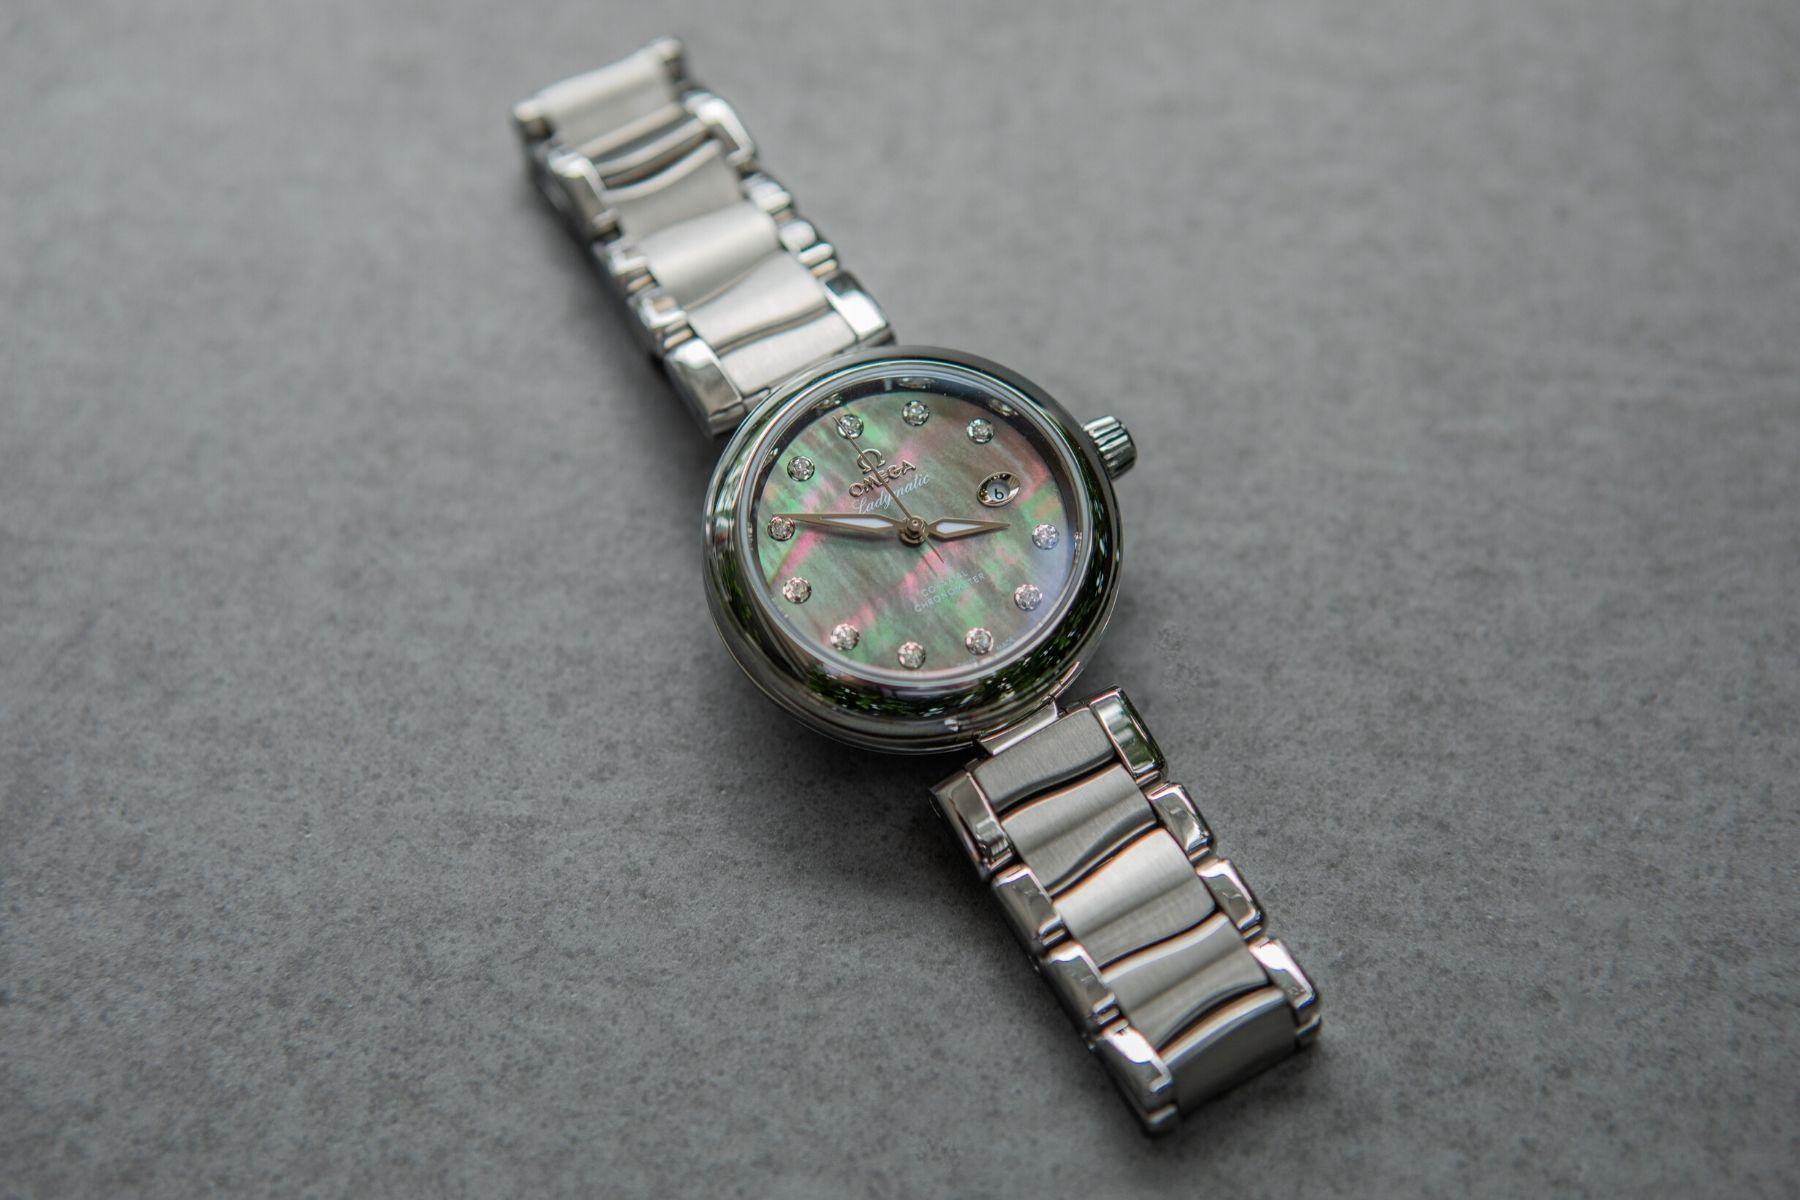 El Reloj Replica Omega Ladymatic